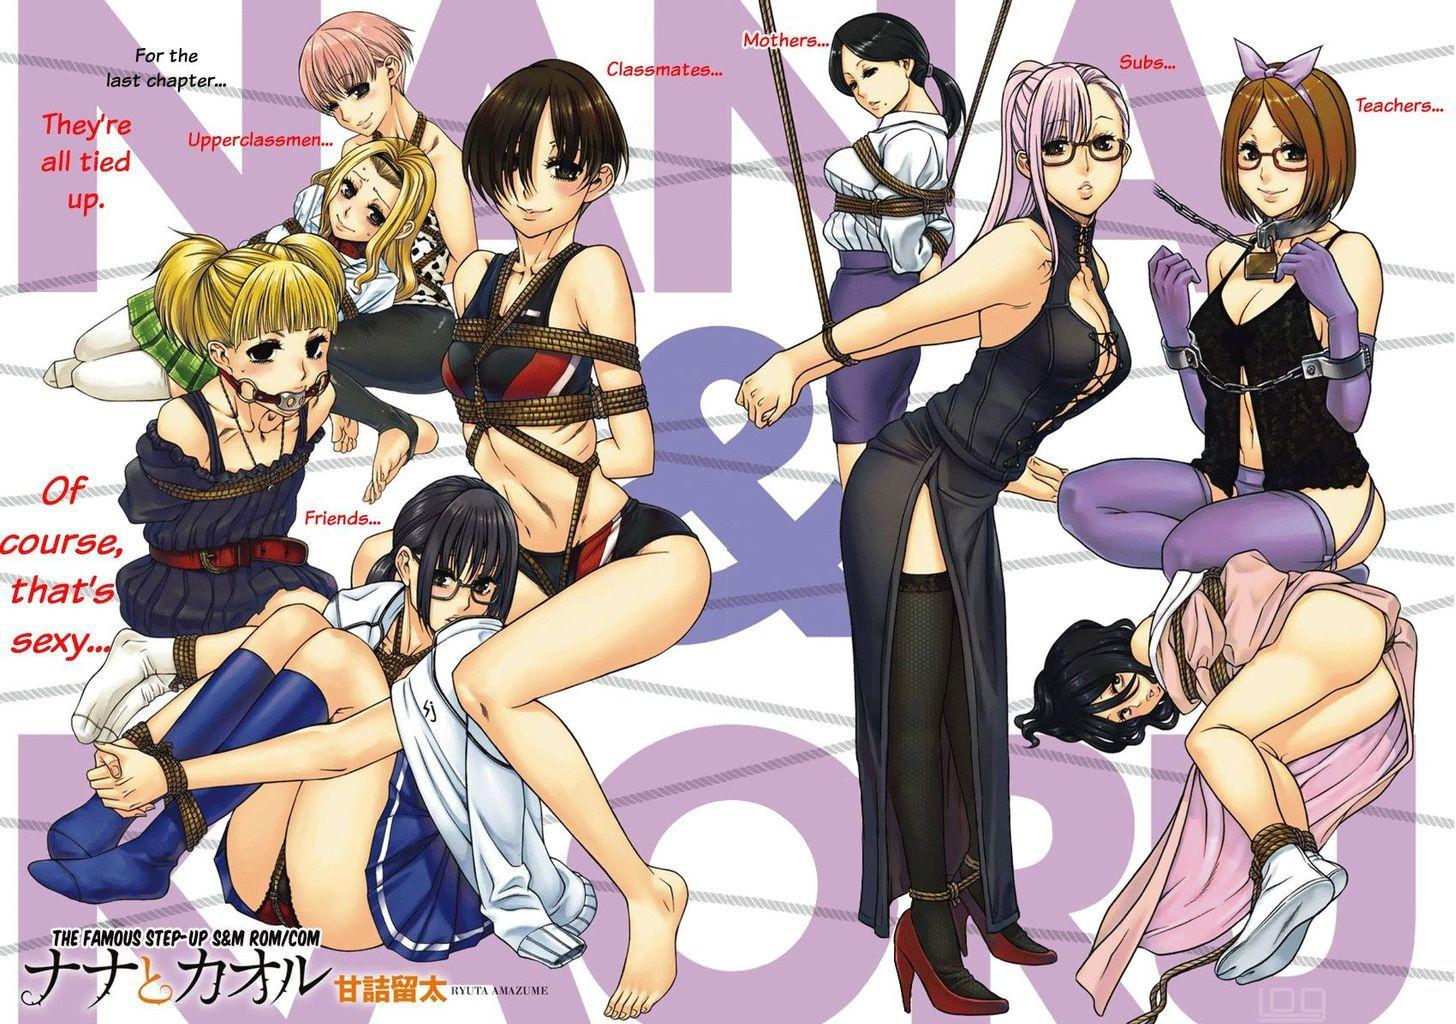 http://im.nineanime.com/comics/pic9/38/230/287975/NanatoKaoru1560197.jpg Page 1